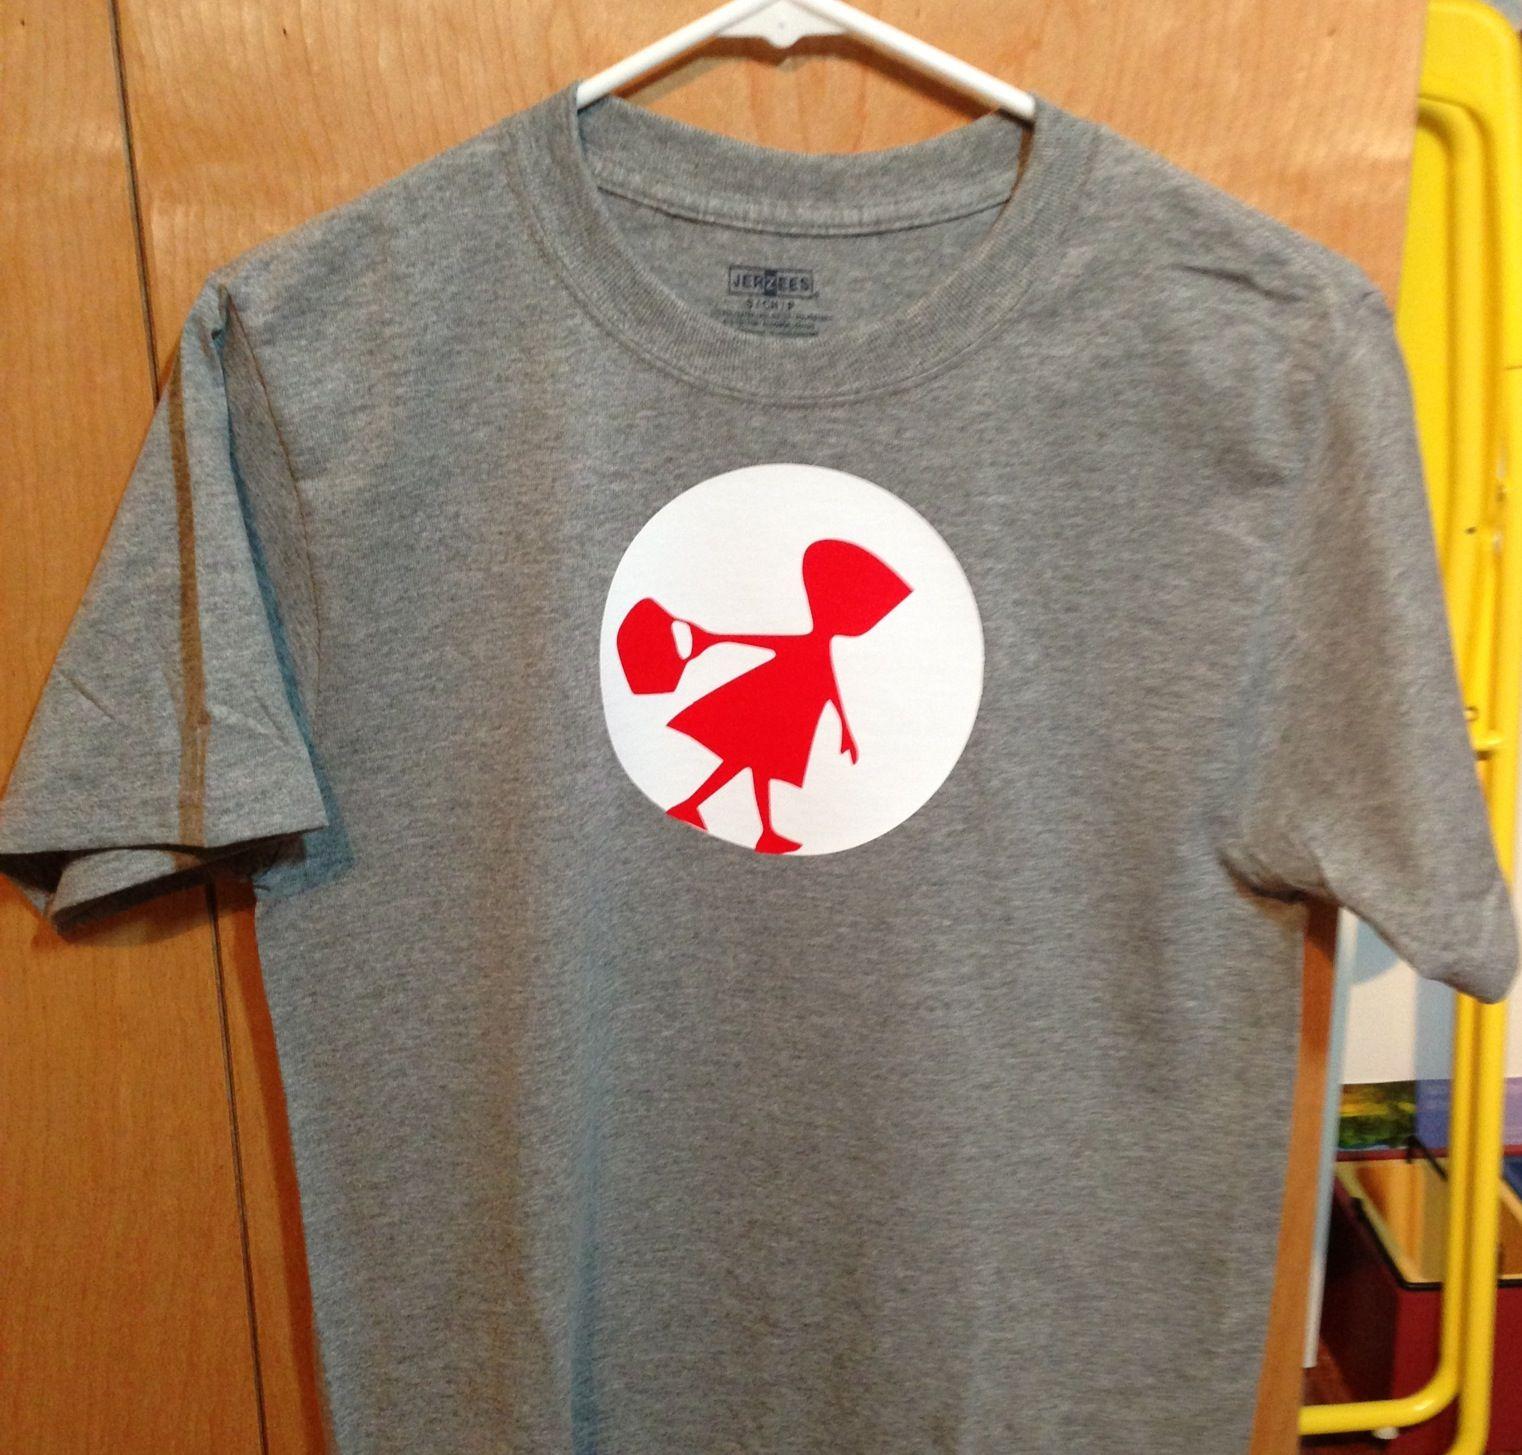 c34963c9 Red riding hood shirt I made with my Cameo. Heat transfer vinyl ...